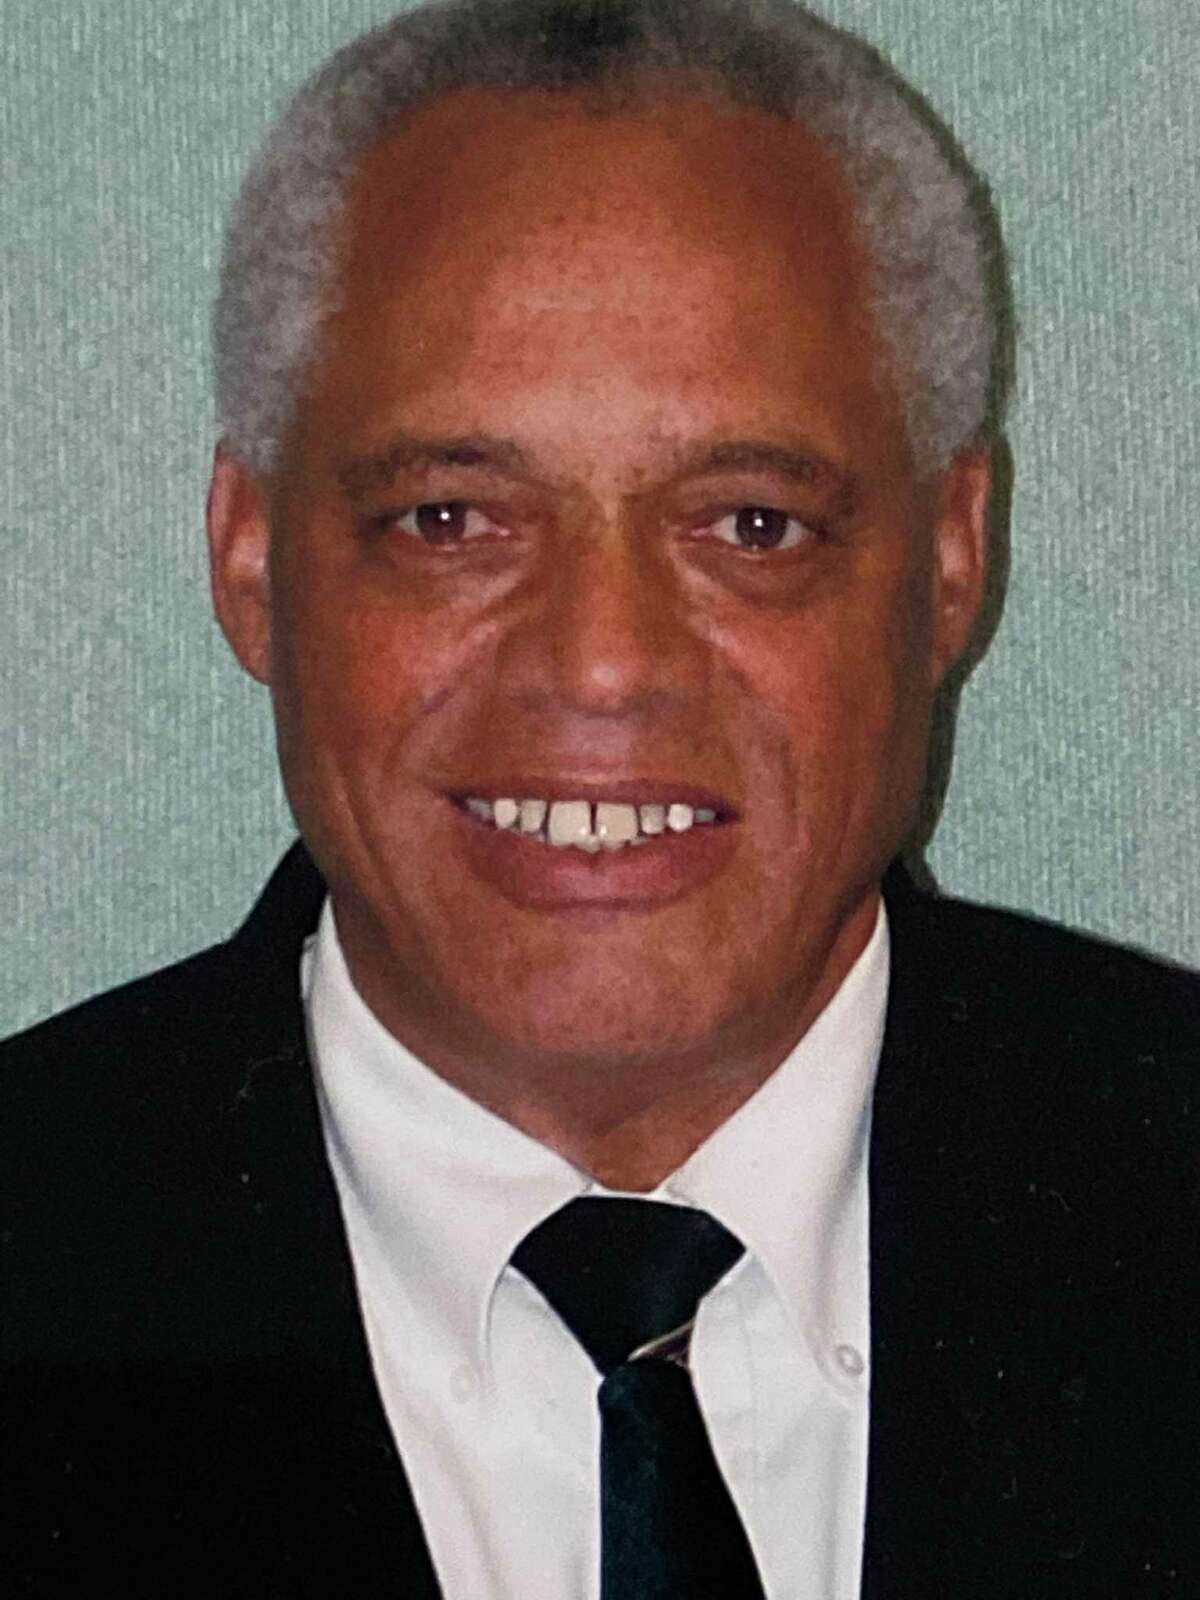 Dennis Guimares